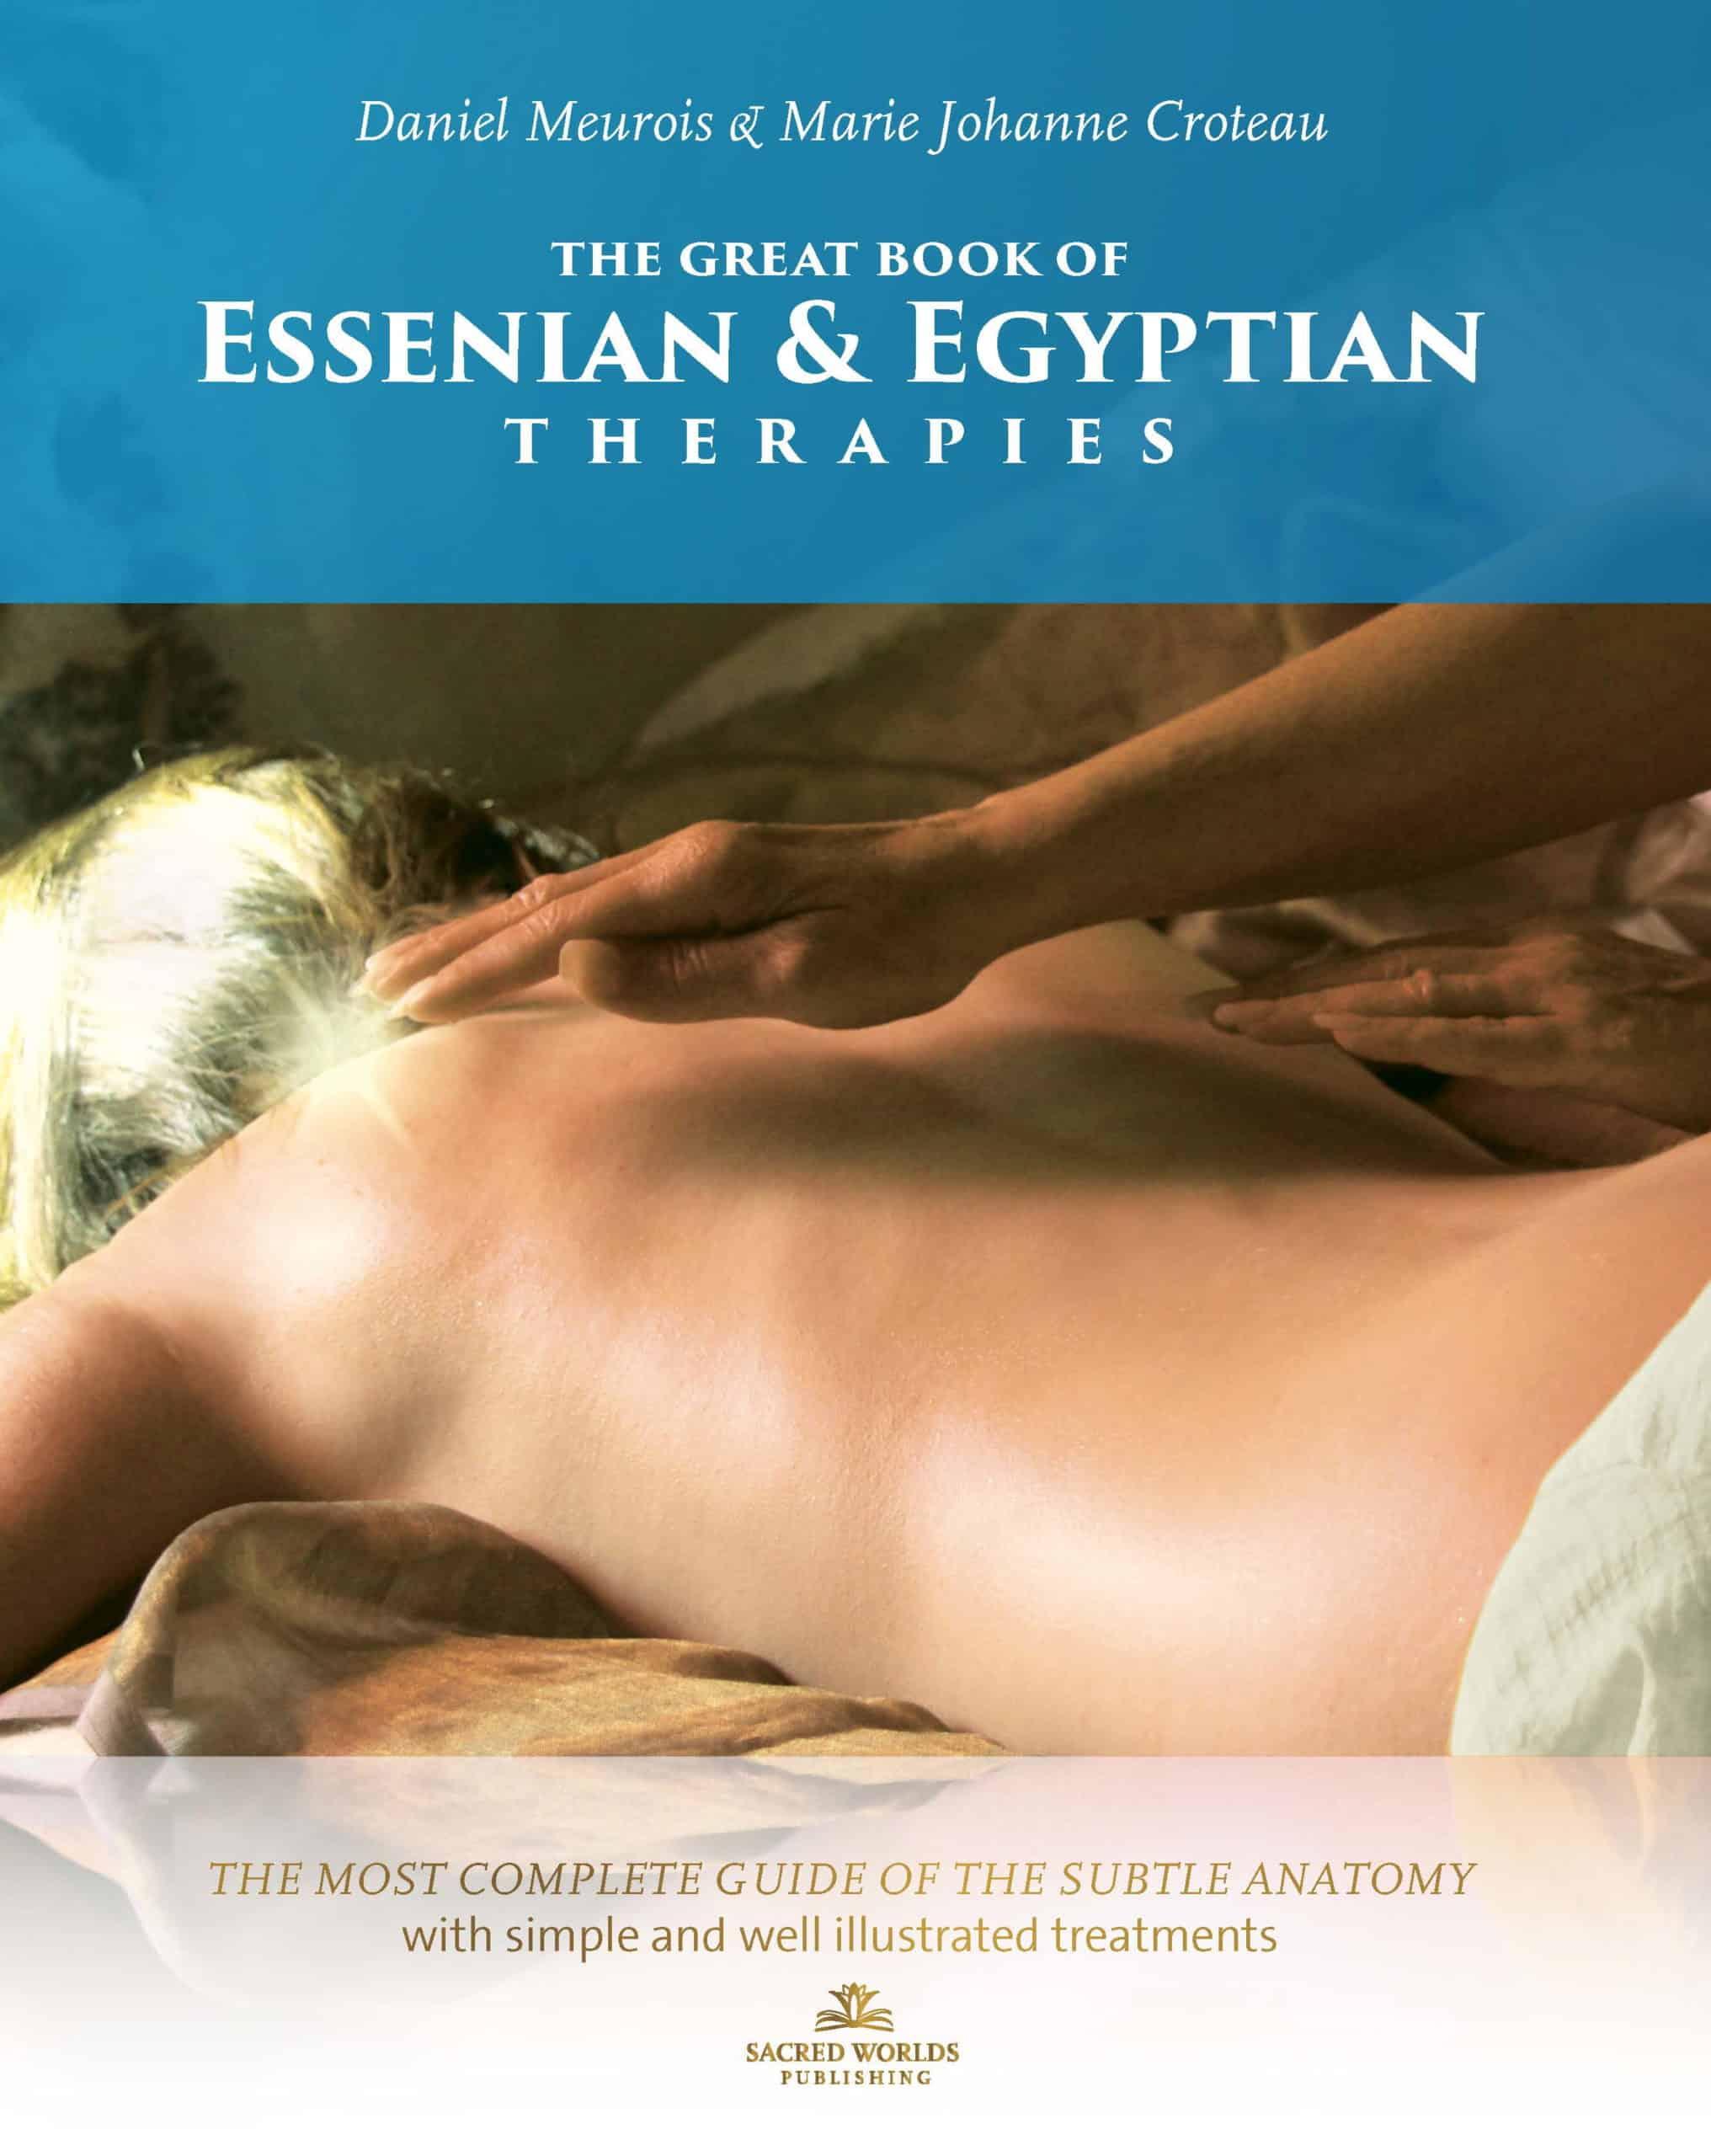 Compendio du Terapie Egizie ed Essene Daniel Meurois Marie-Johanne Croteau